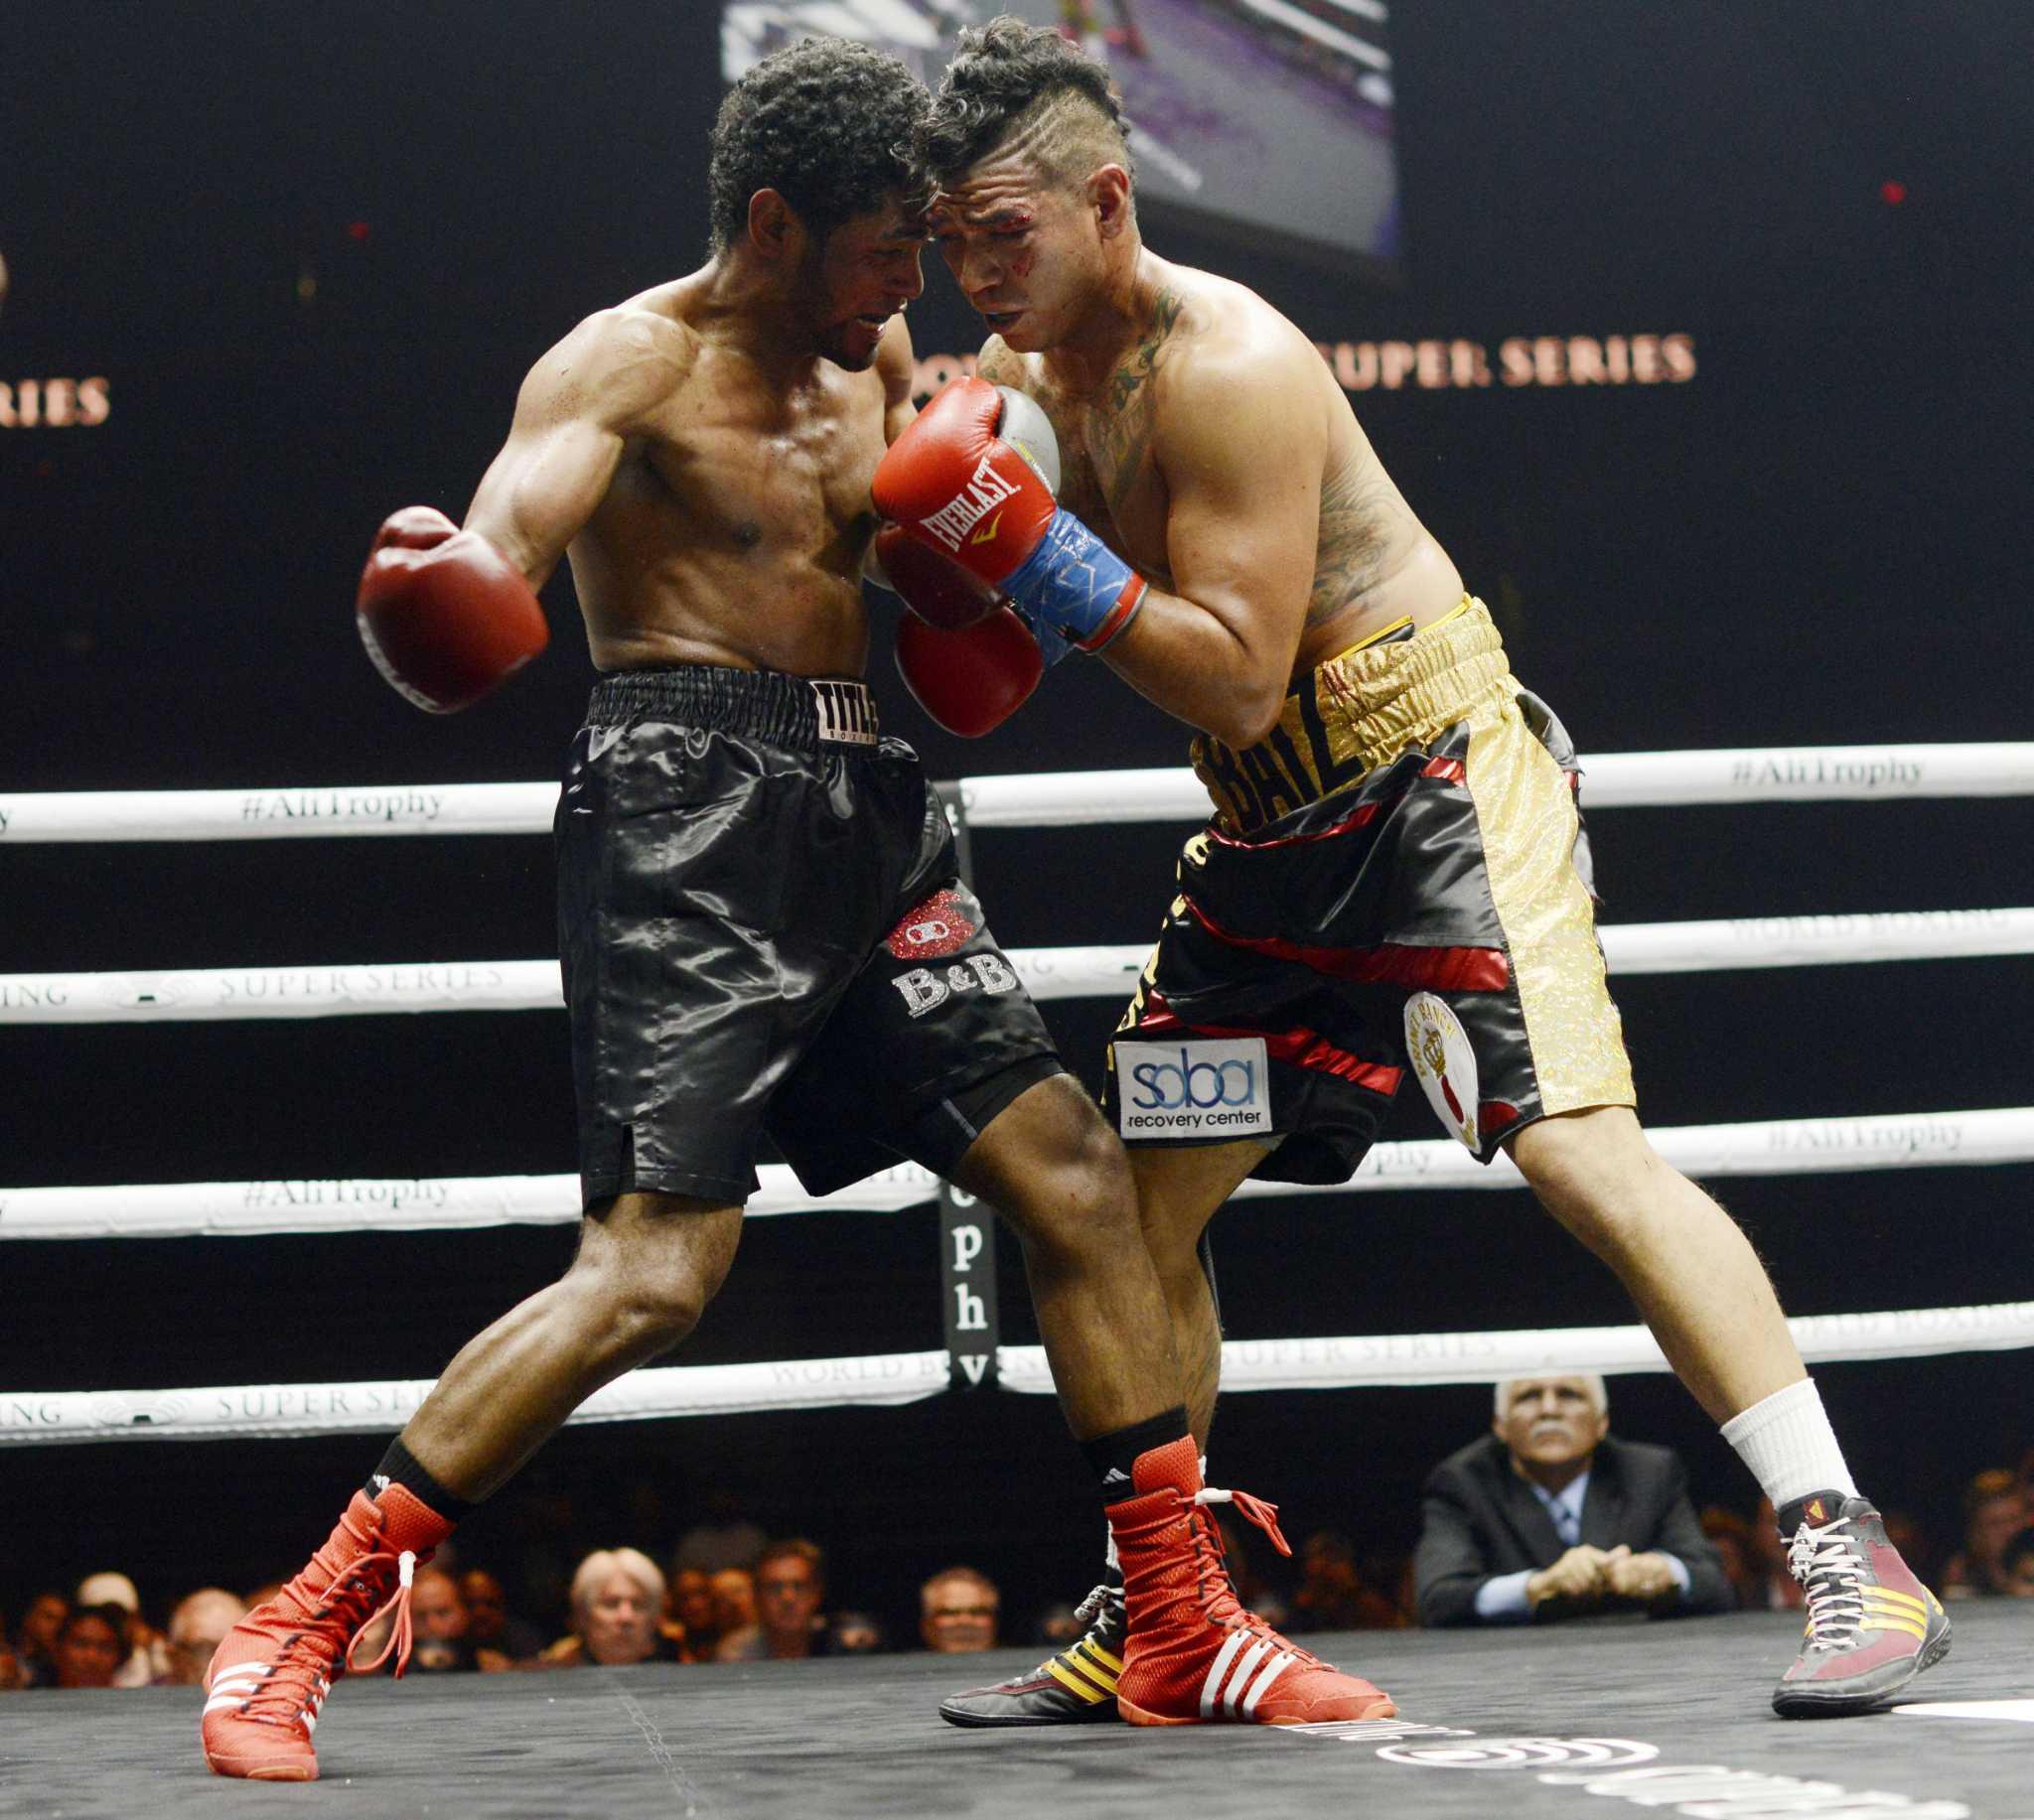 Alexis Texas Boxing san antonio welterweight daniel baiz battles to a split